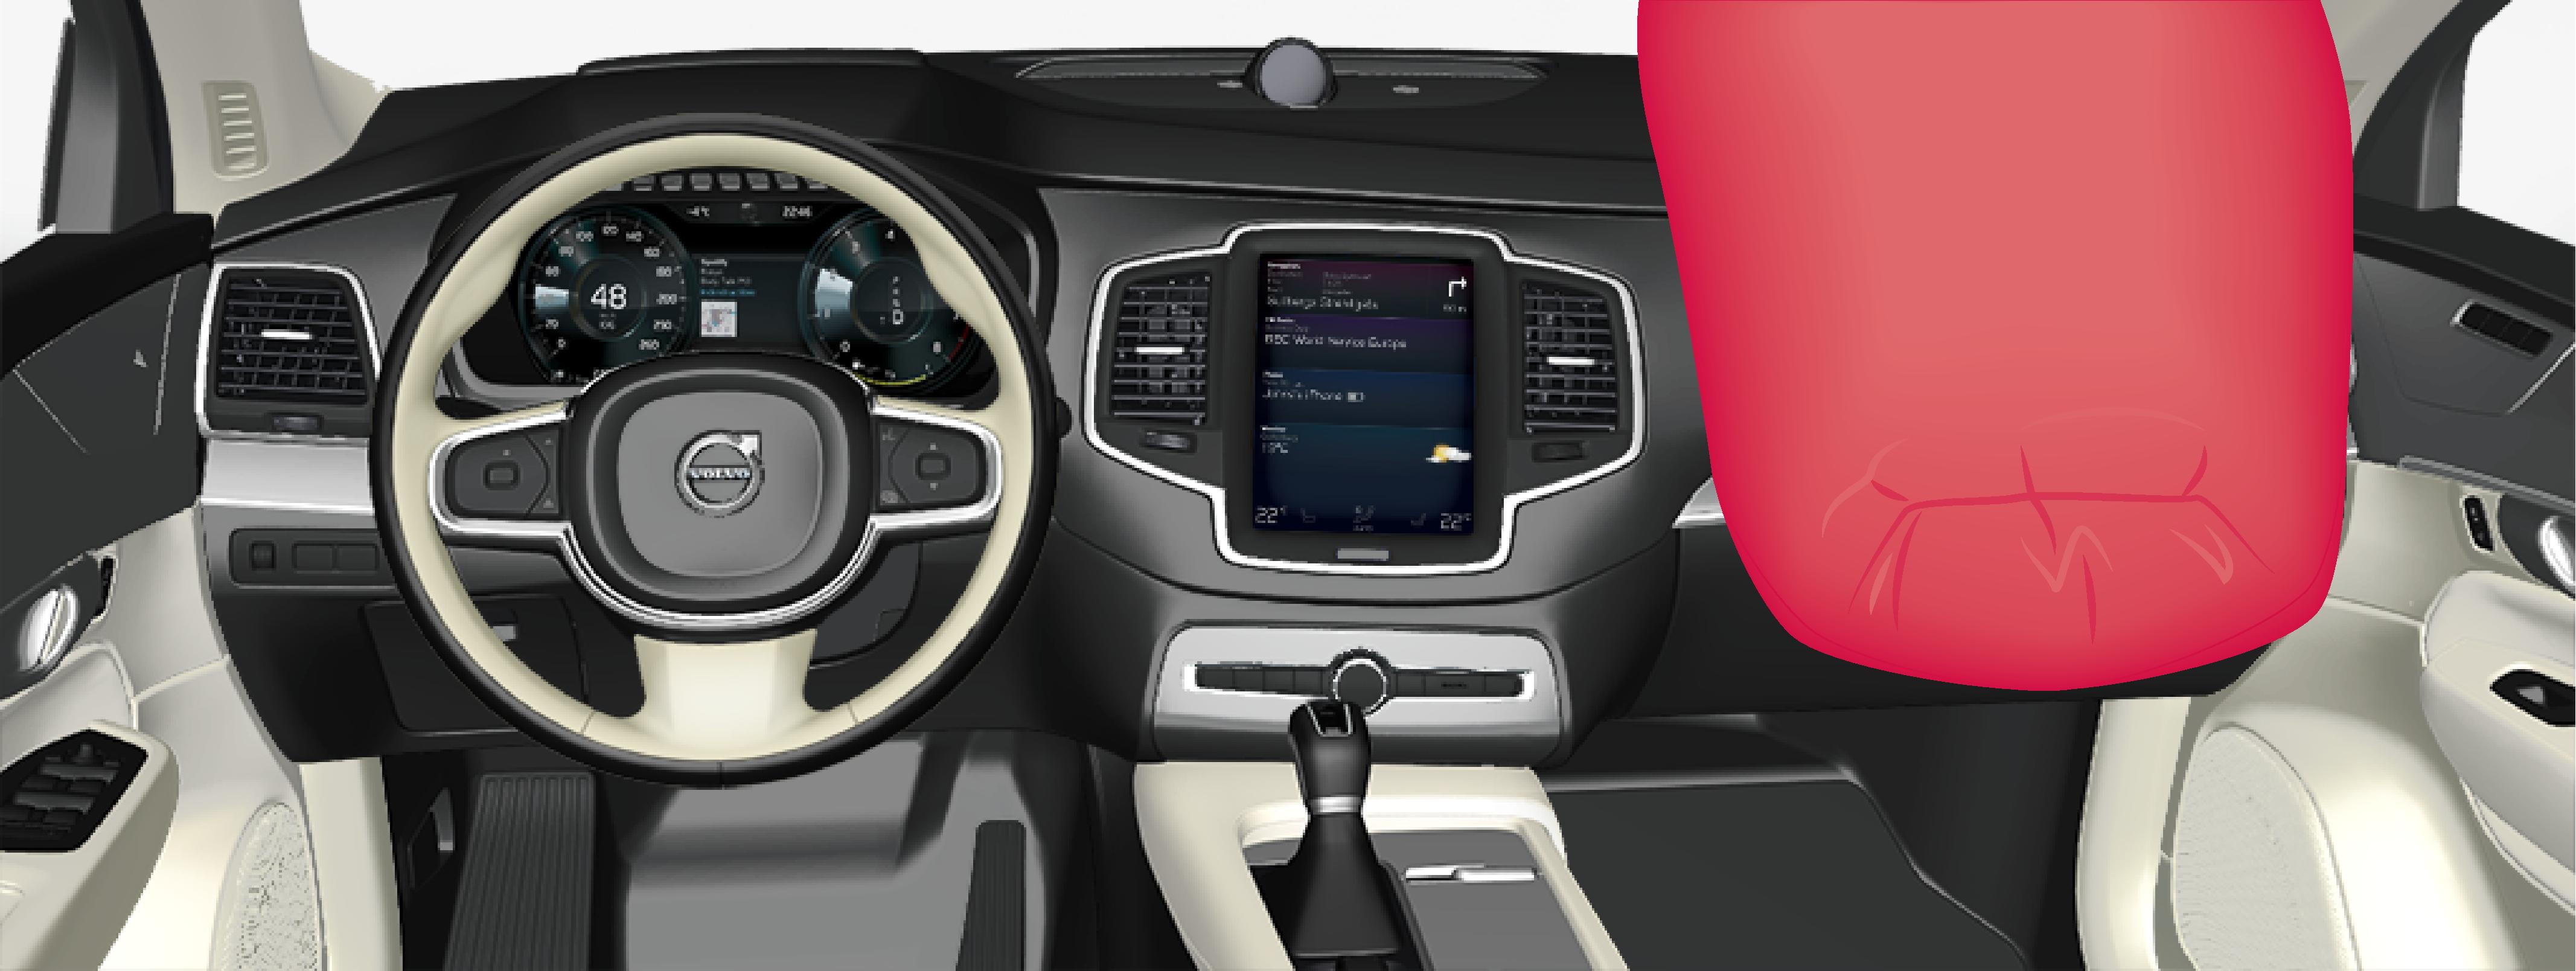 P5-1746-XC90–Safety–Passenger airbag